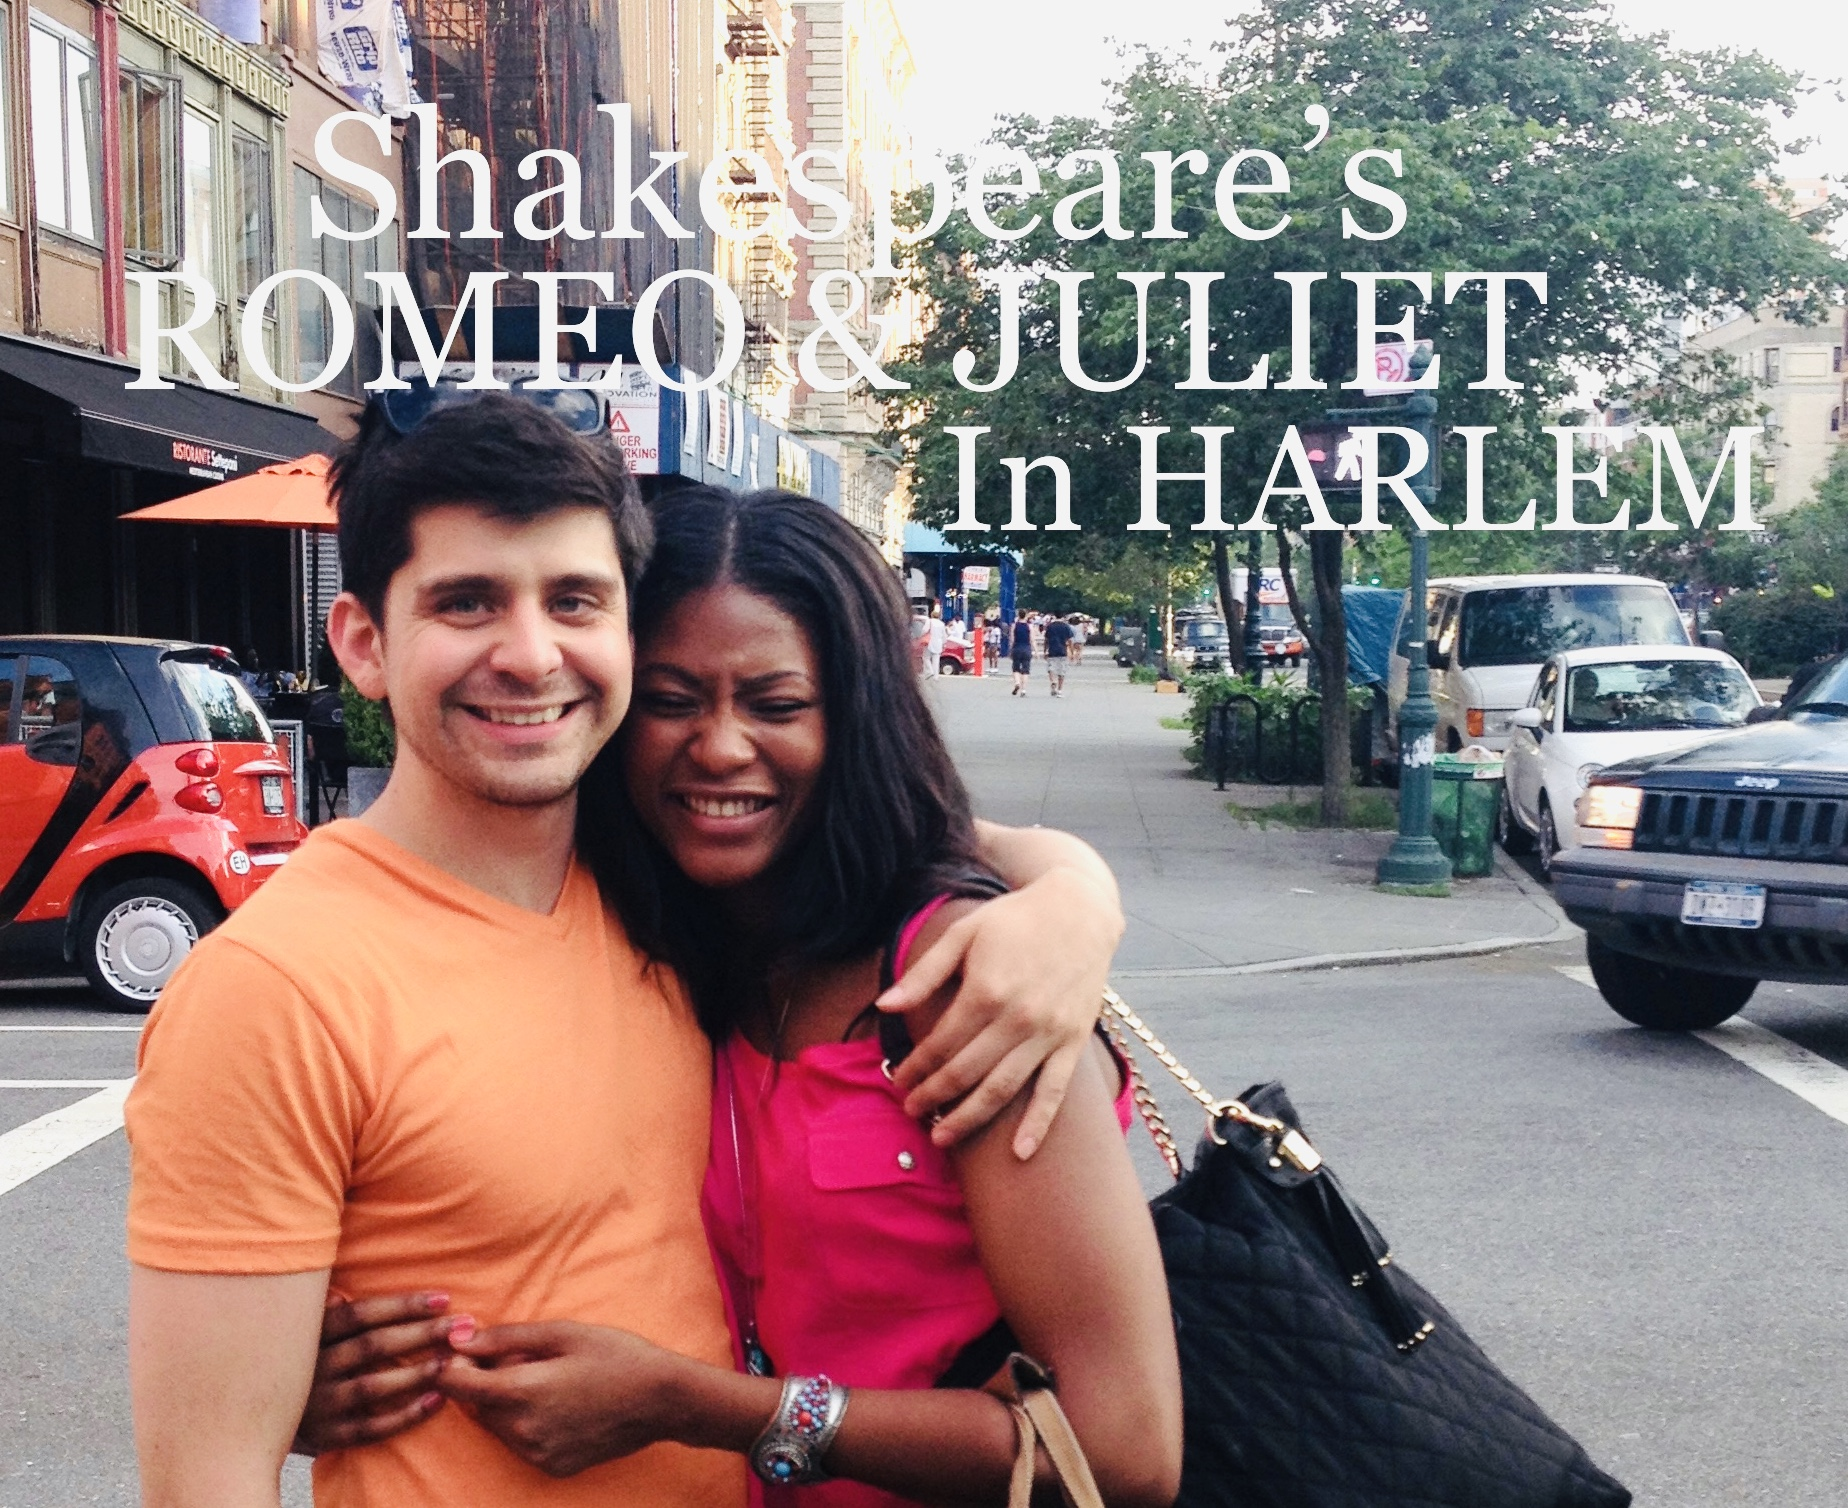 Romeo & Juliet in Harlem